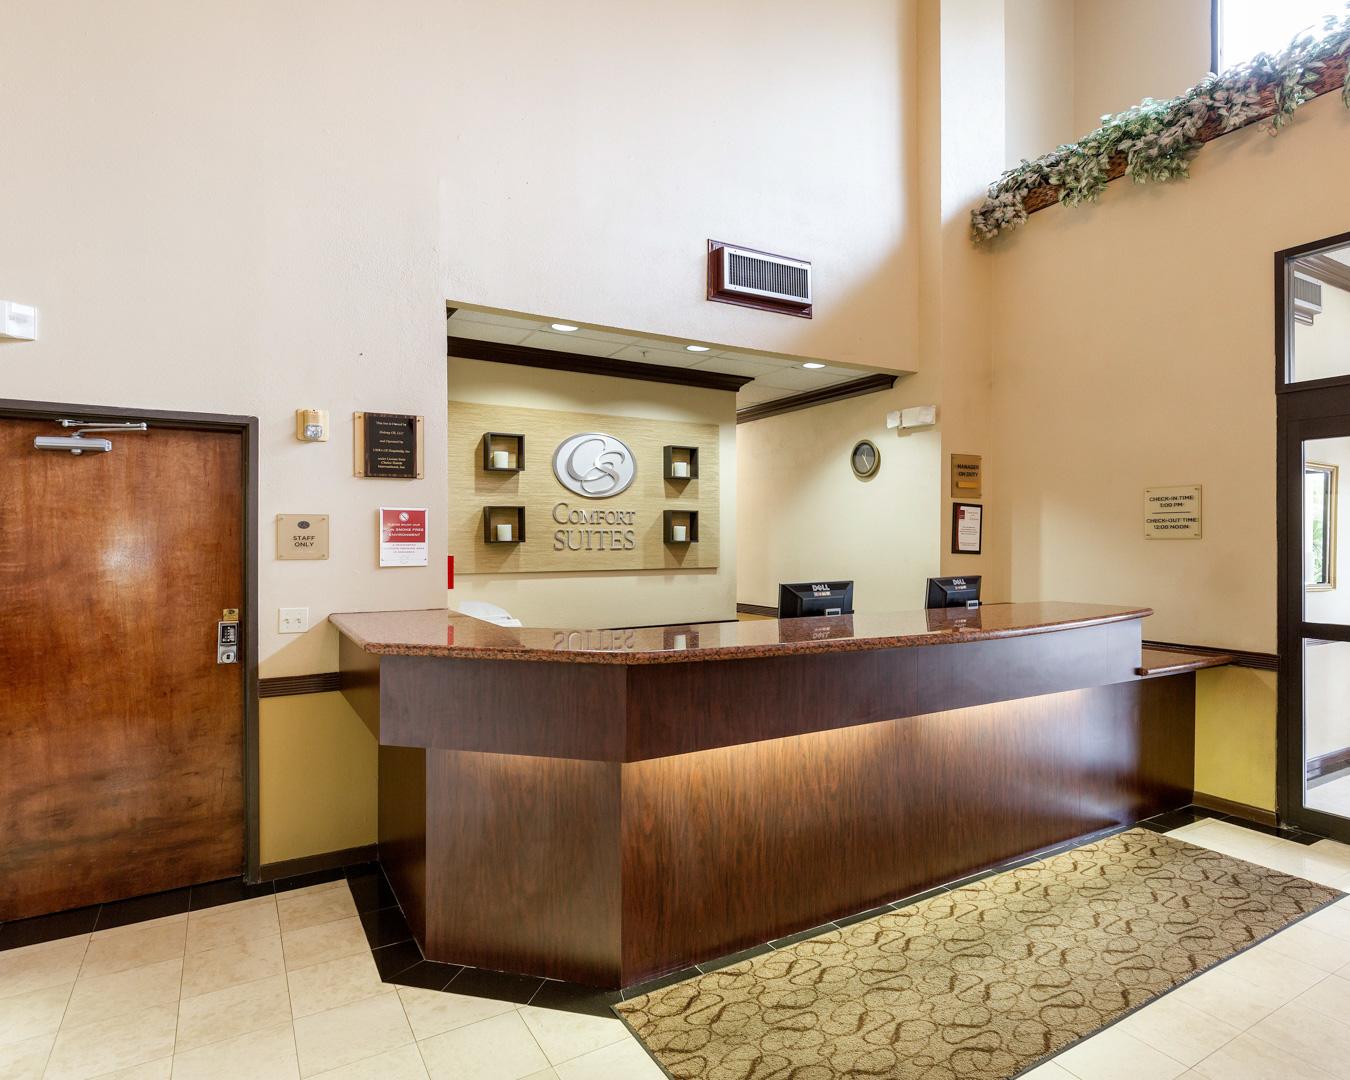 Hotels Near Bush Airport Houston Tx